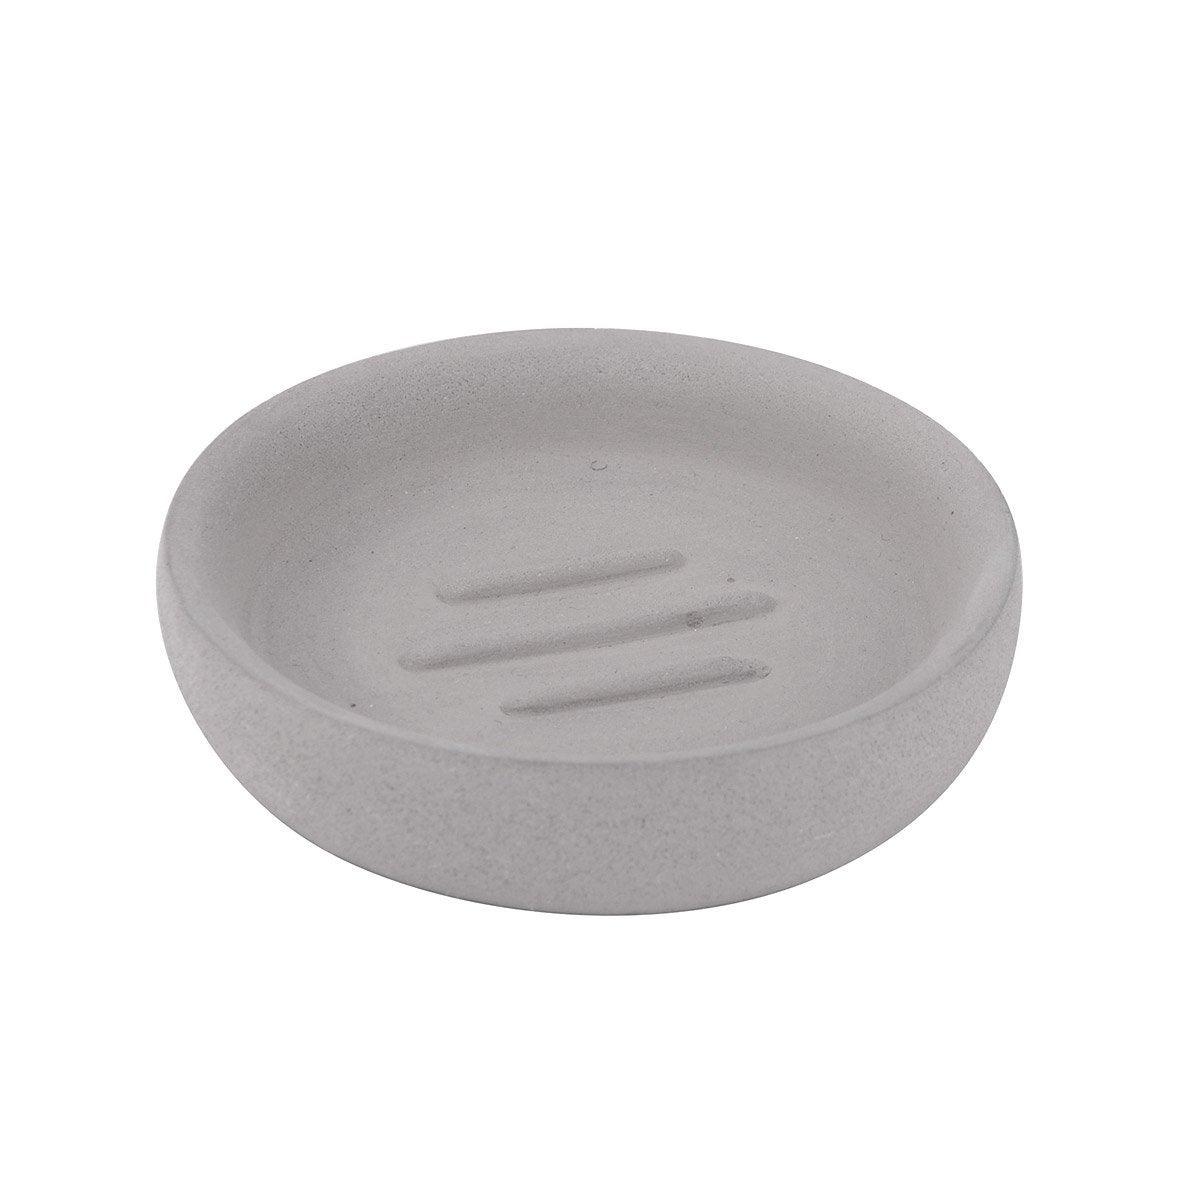 Porte-savon béton Apollon, gris clair